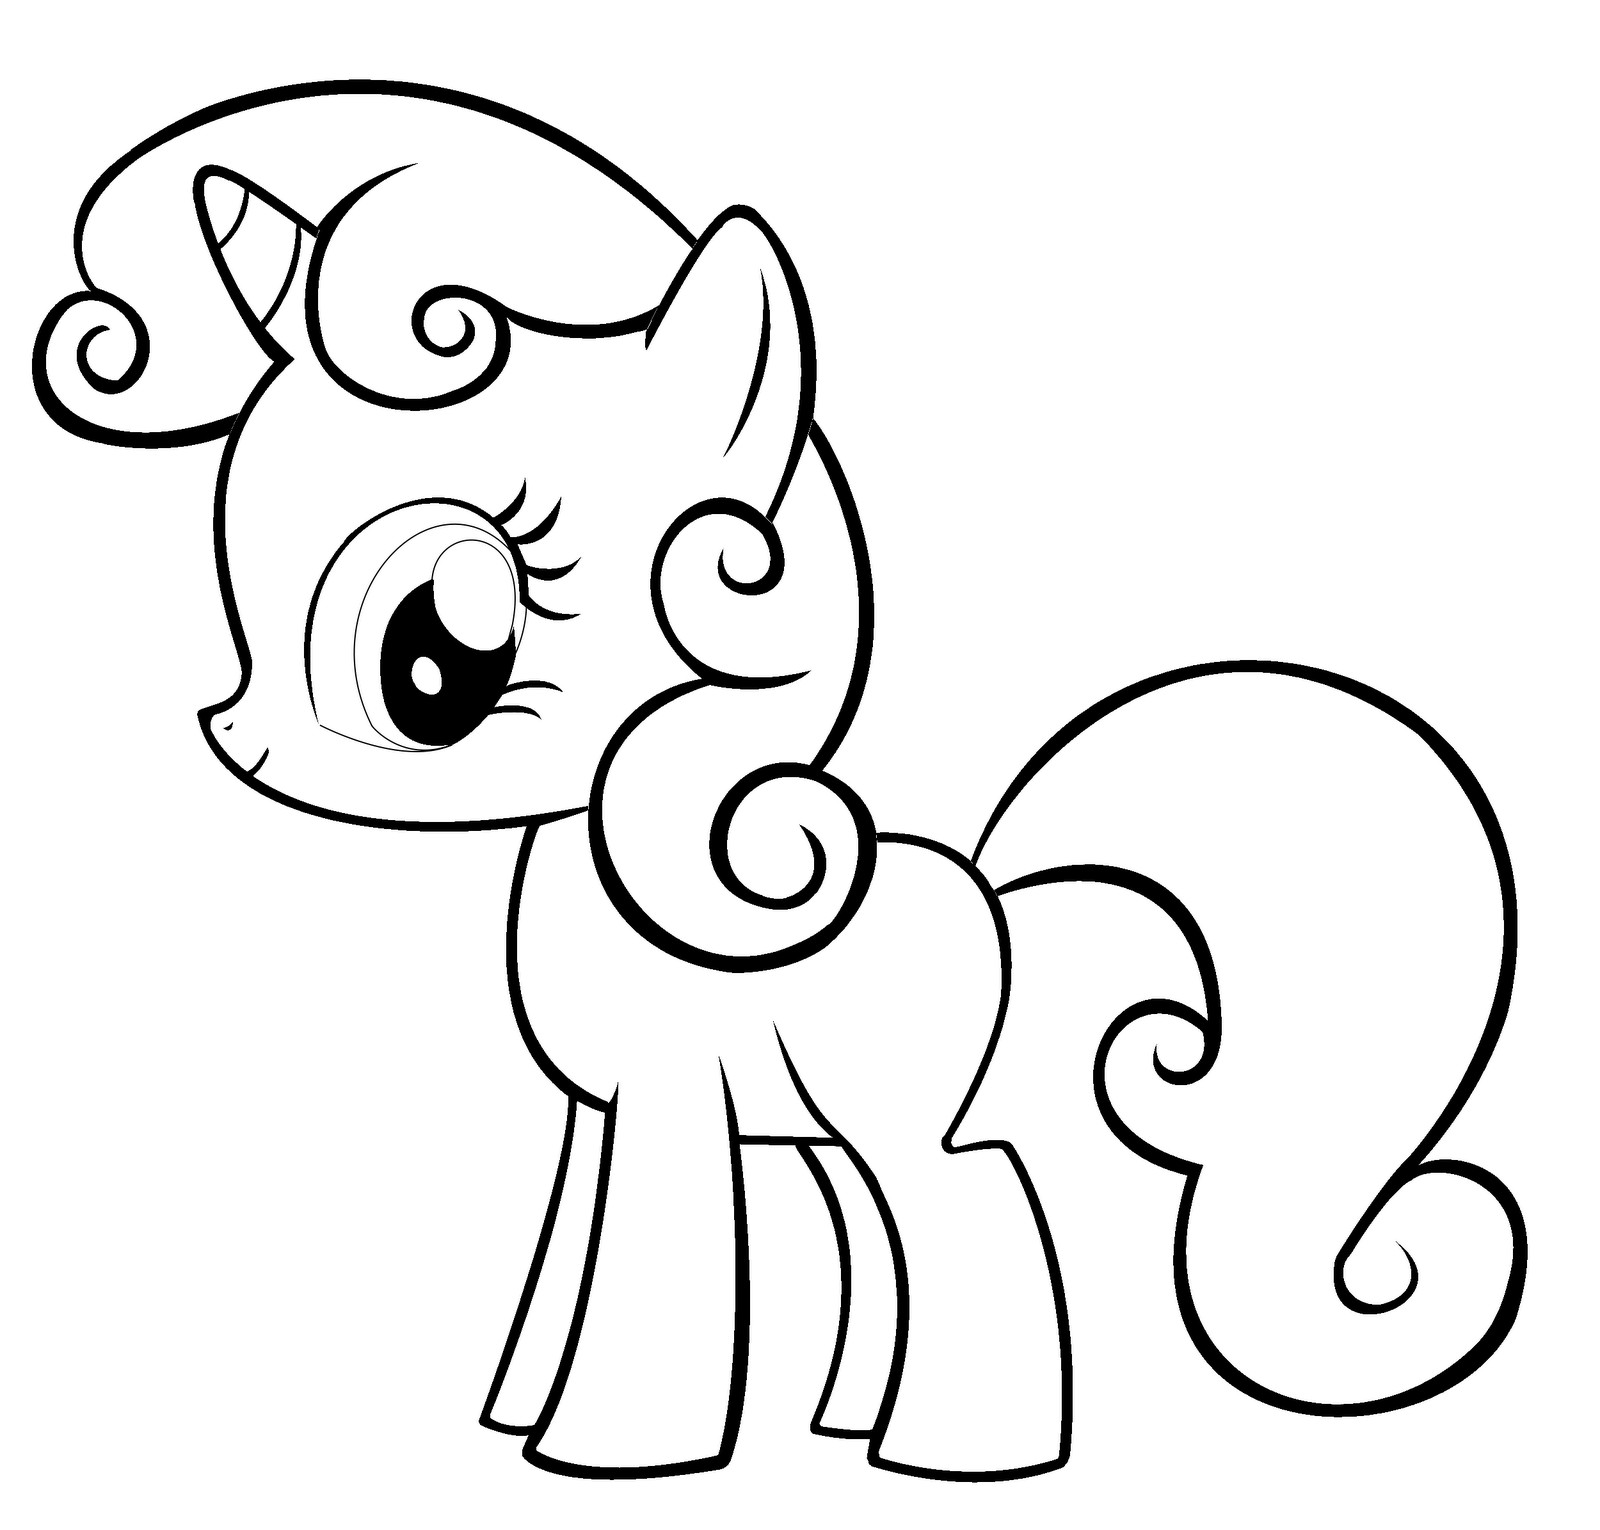 1600x1530 Cute Mlp Coloring Pages Baby Princess Luna